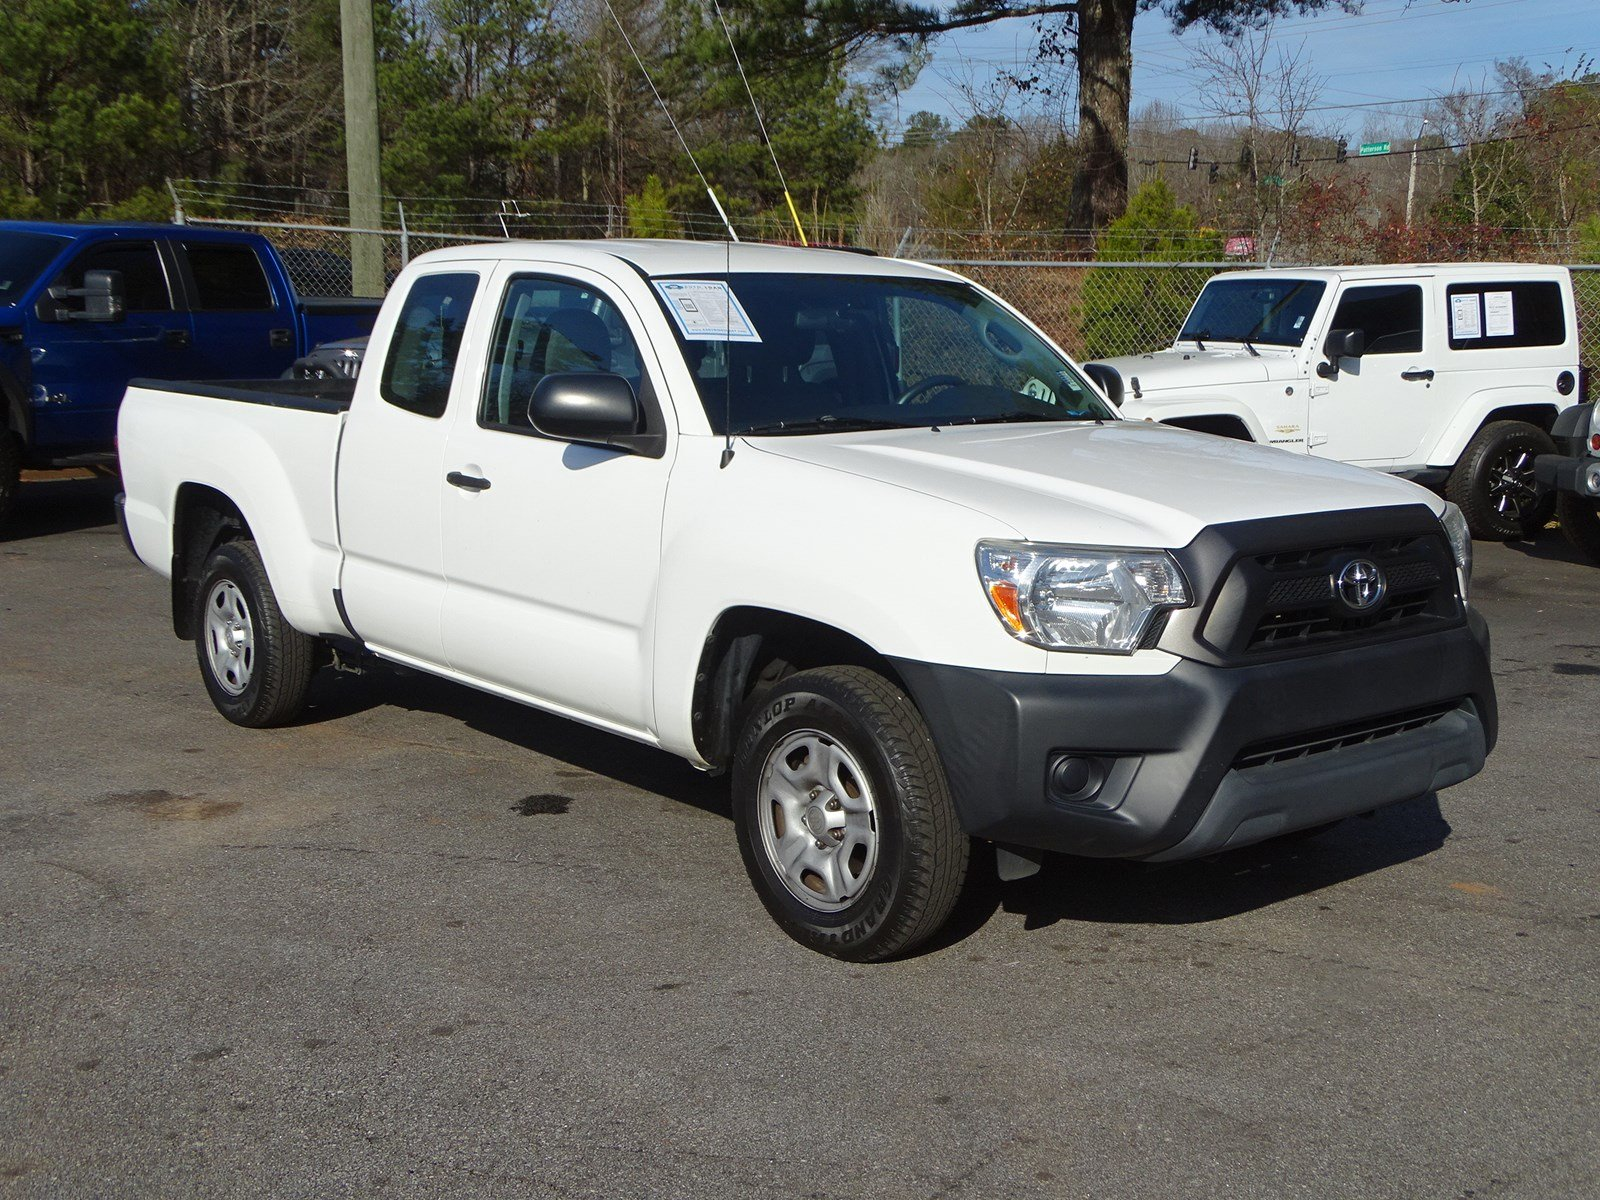 2013 Toyota Tacoma   51288 miles VIN 5TFTX4CN6DX030026 StockNo 12695